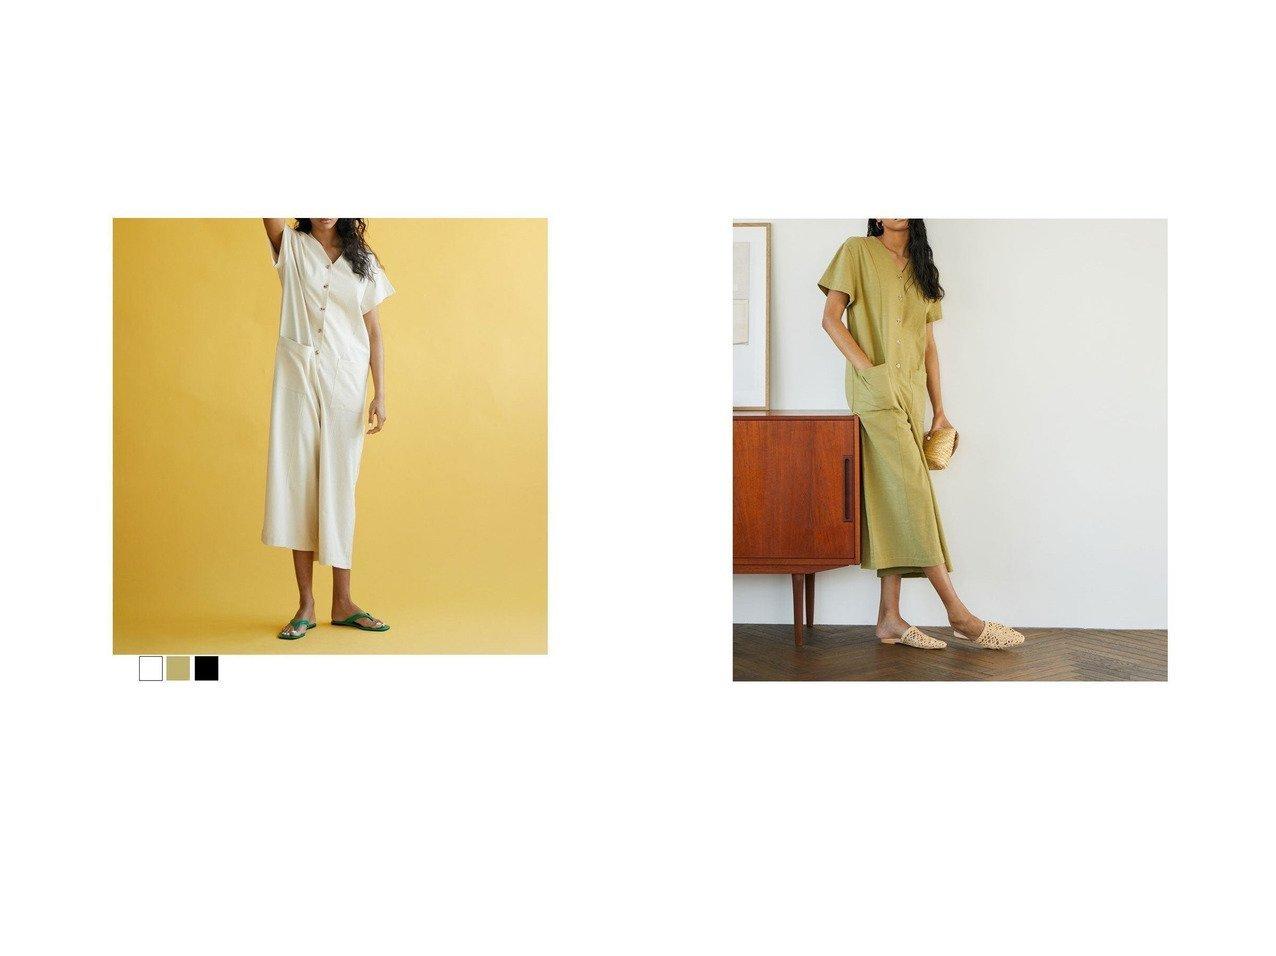 【Brown and Street/ブラウンアンドストリート】のリネン混リラクシーオールインワン 【ワンピース・ドレス】おすすめ!人気、トレンド・レディースファッションの通販 おすすめで人気の流行・トレンド、ファッションの通販商品 インテリア・家具・メンズファッション・キッズファッション・レディースファッション・服の通販 founy(ファニー) https://founy.com/ ファッション Fashion レディースファッション WOMEN ワンピース Dress オールインワン ワンピース All In One Dress 春 Spring くるぶし シンプル ネップ 人気 バランス ペチコート リネン 2021年 2021 S/S・春夏 SS・Spring/Summer 2021春夏・S/S SS/Spring/Summer/2021 おすすめ Recommend 夏 Summer |ID:crp329100000047607